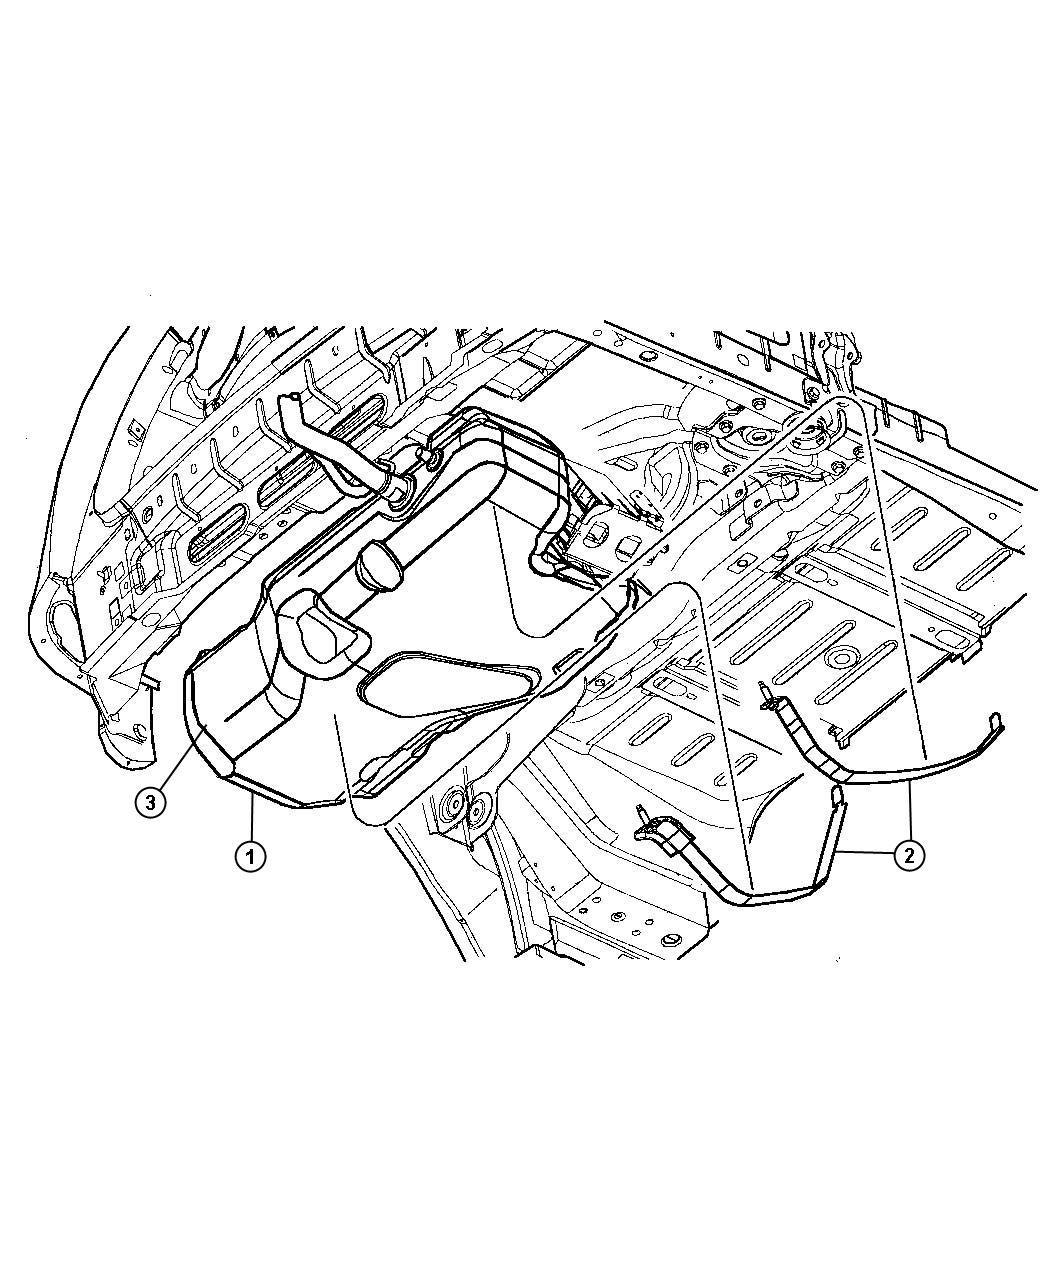 Chrysler Pt Cruiser Shield Fuel Tank Heat